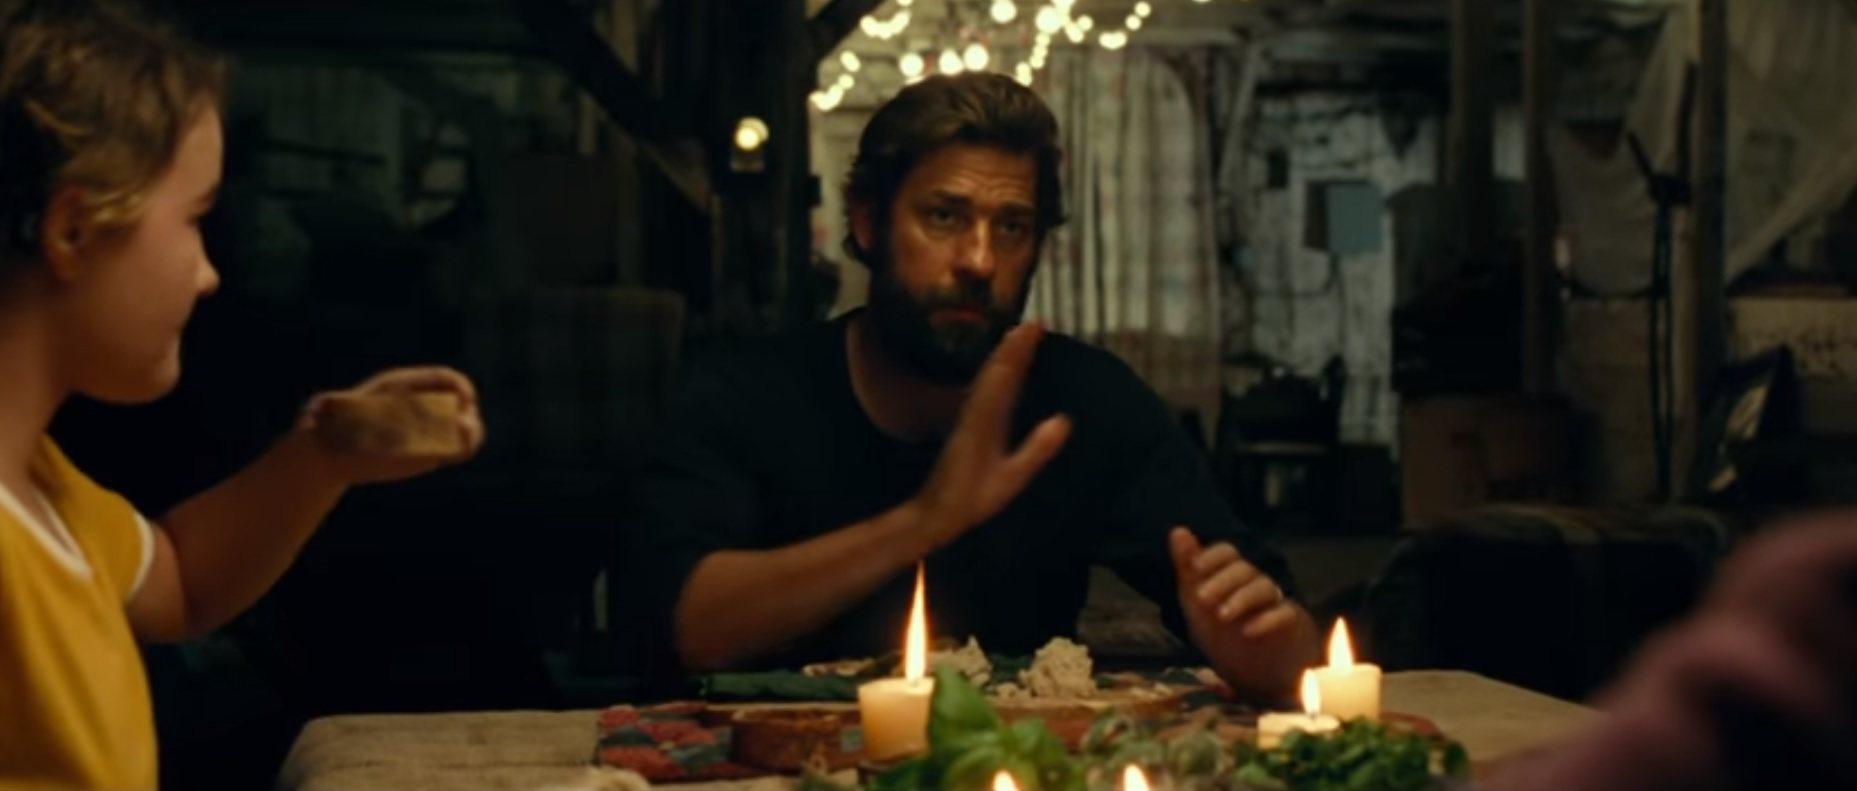 "New Paltz New York >> Trailer for John Krasinski's New Film ""A Quiet Place"